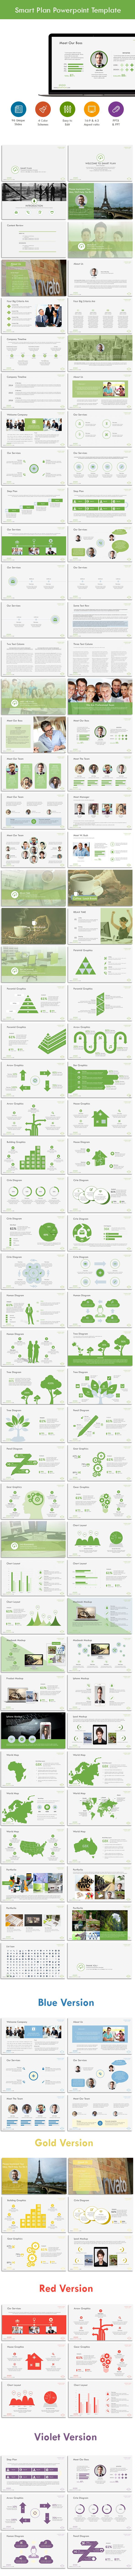 Smart Plan Powerpoint Template #design #slides Download: http://graphicriver.net/item/smart-plan-powerpoint-template/12714715?ref=ksioks